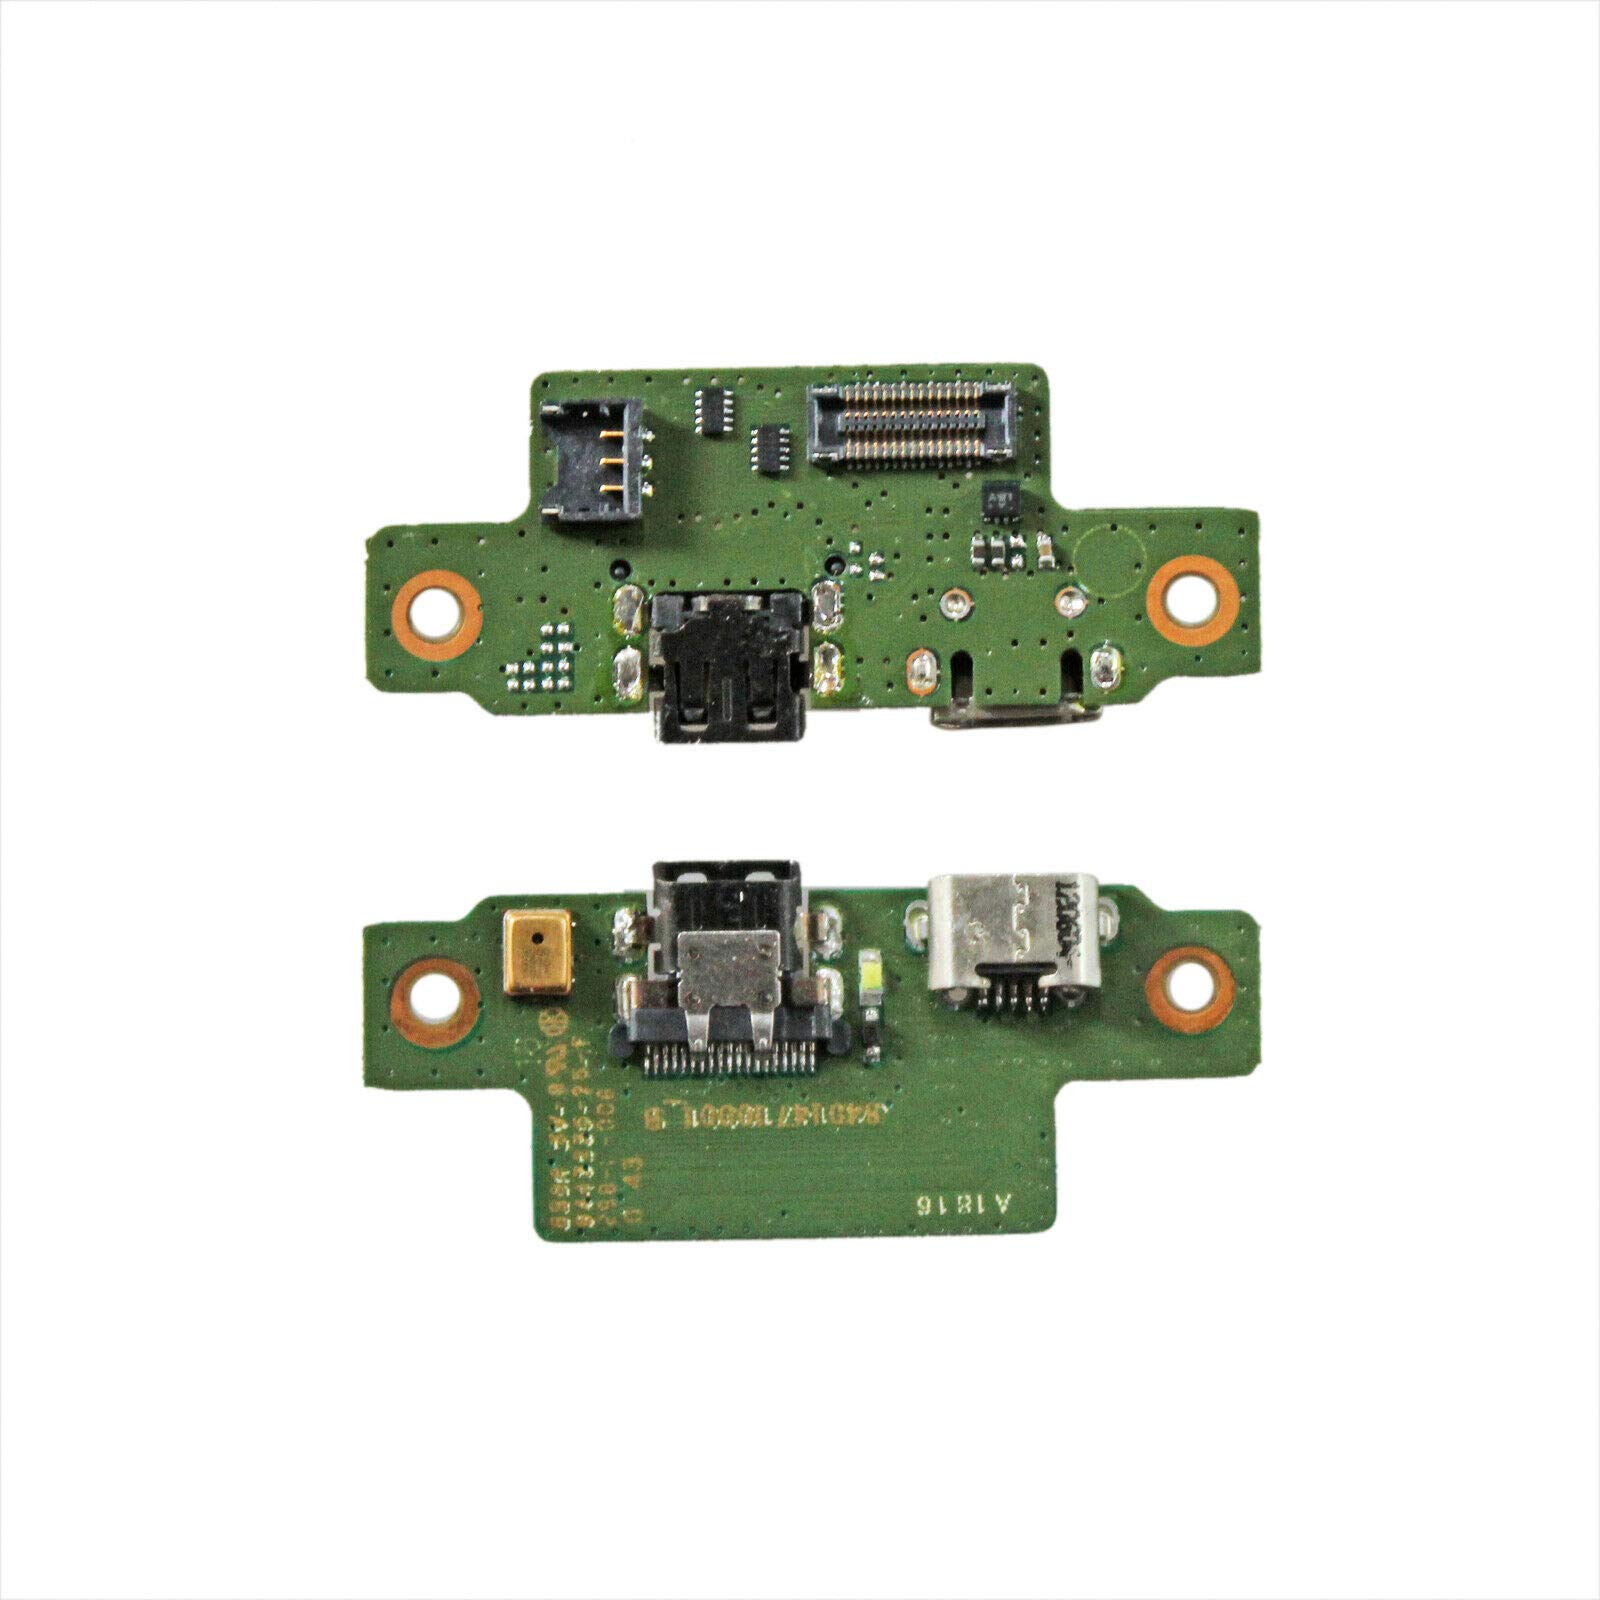 Zahara USB HDMI Charging Port Flex Board Replacement for Motorola Xoom 2 MZ615 MZ616 MZ617